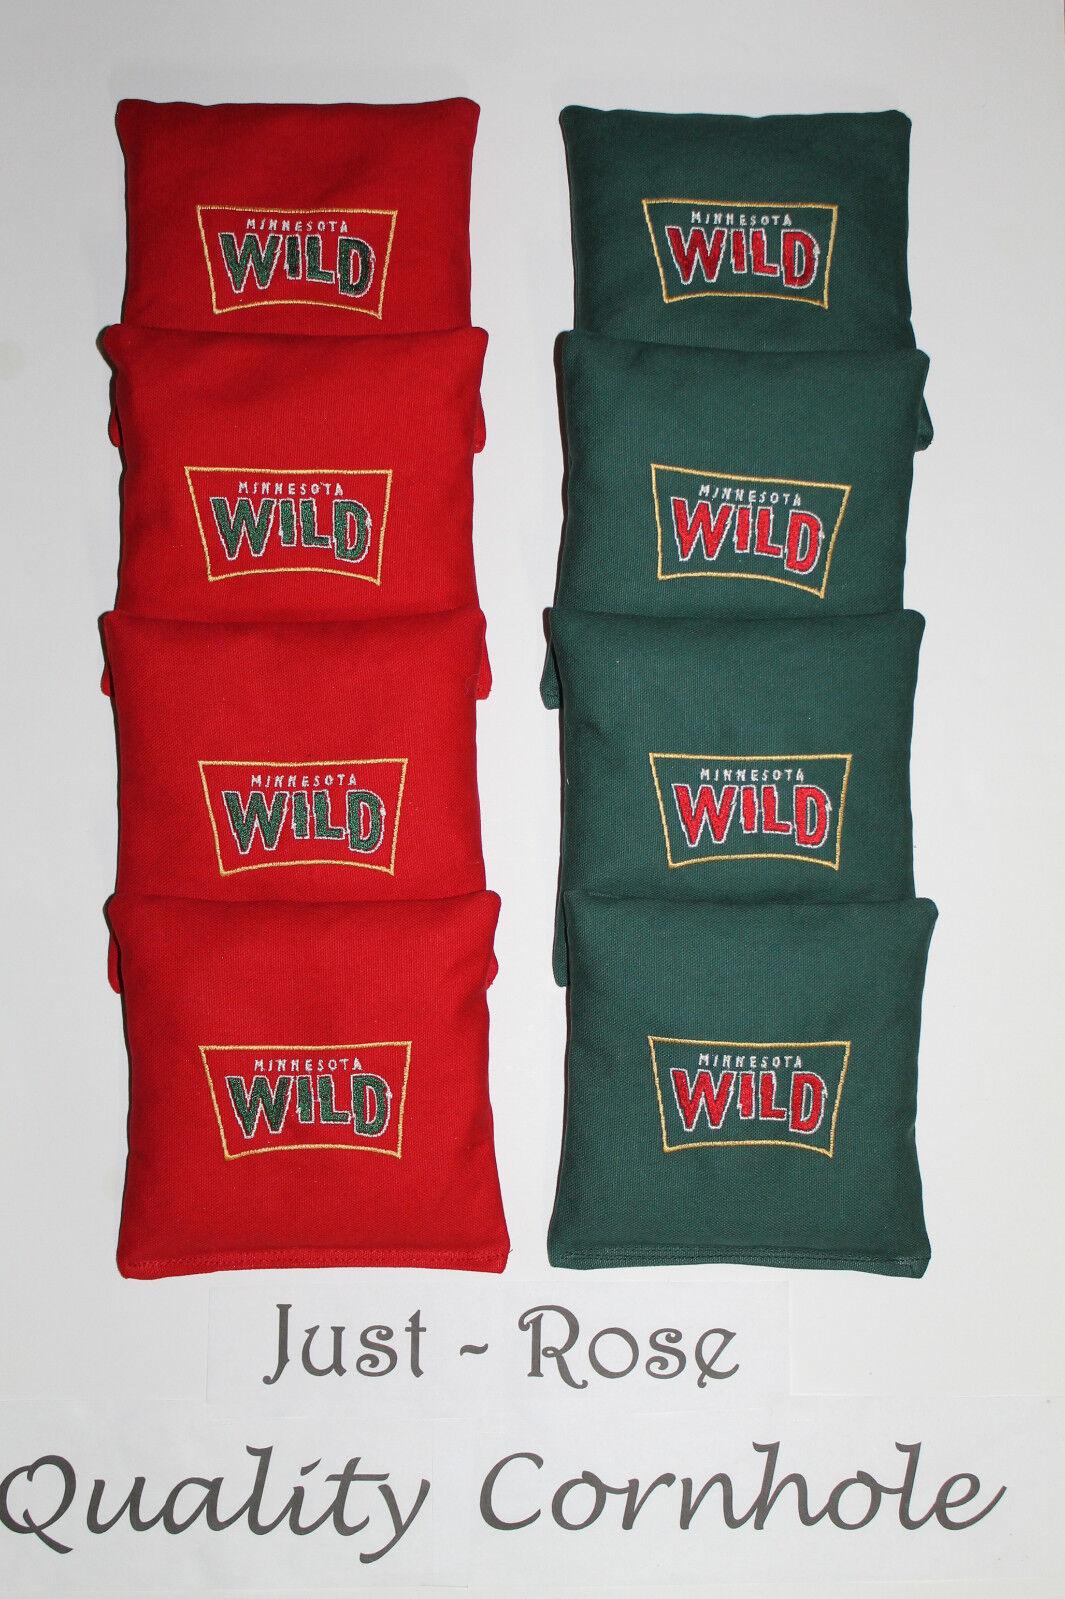 MINNESOTA  MN WILD NHL Cornhole ACA REGULATION Bean Corn TOSS Bags EMBROIDERED  fitness retailer